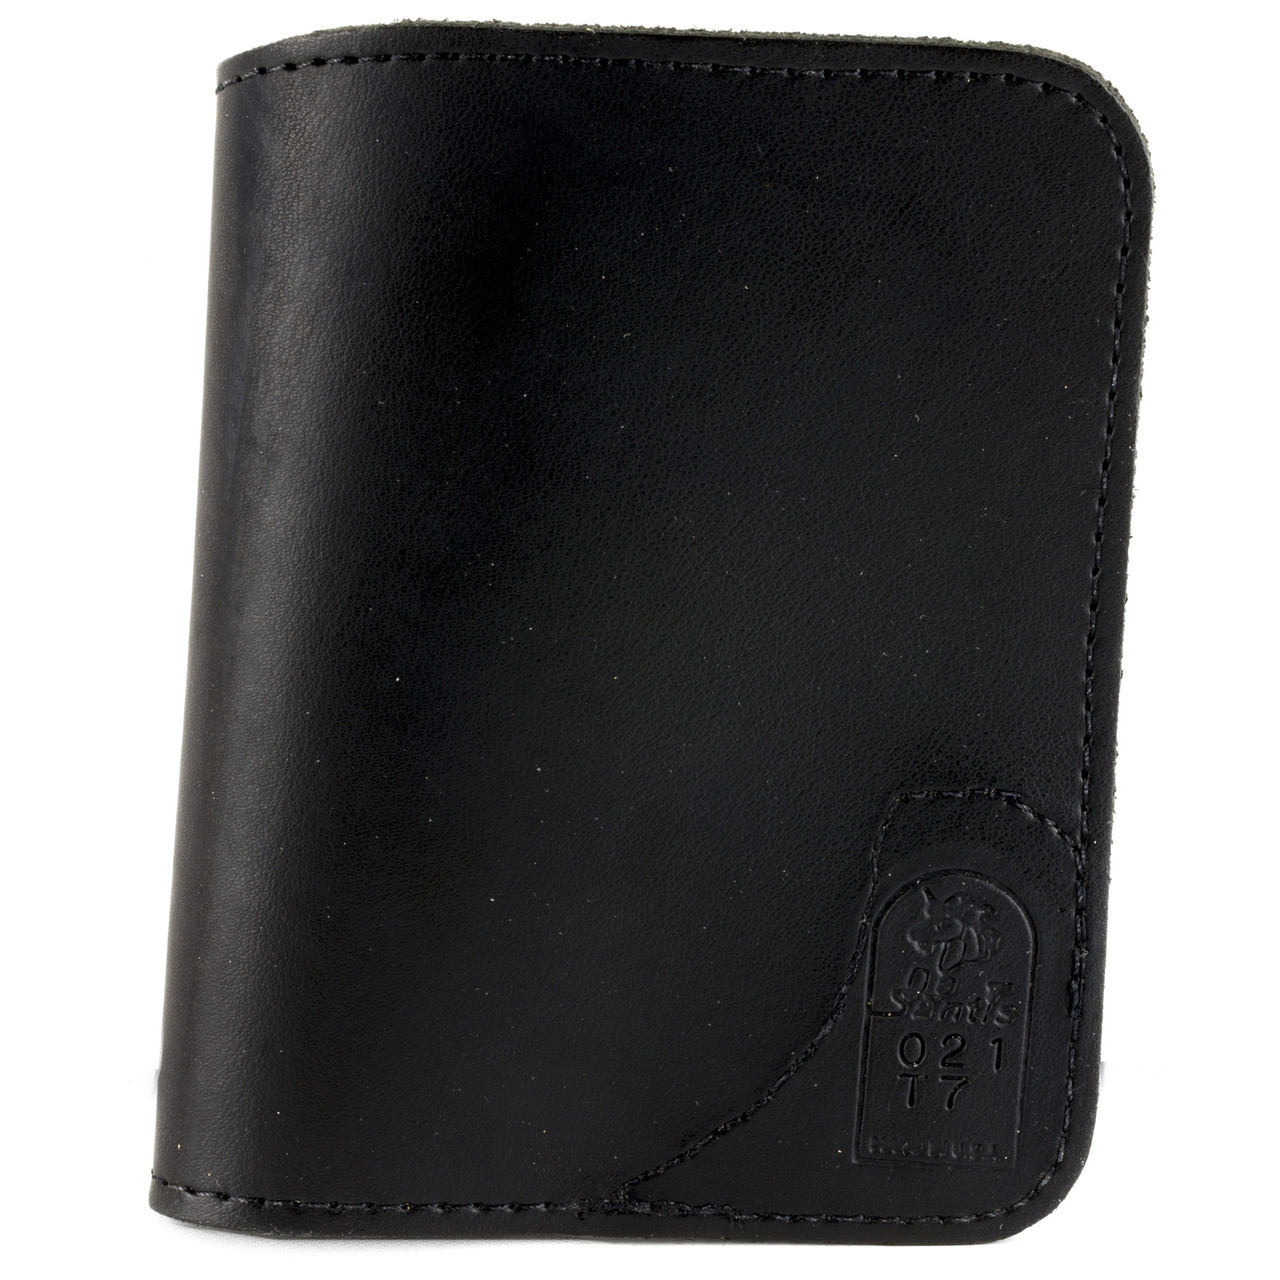 Desantis Trickster Pocket Holster, Fits P3AT & LCP With Crimson Trace  LaserGuard, Ambidextrous, Black 021BJT7Z0, UPC :792695300175